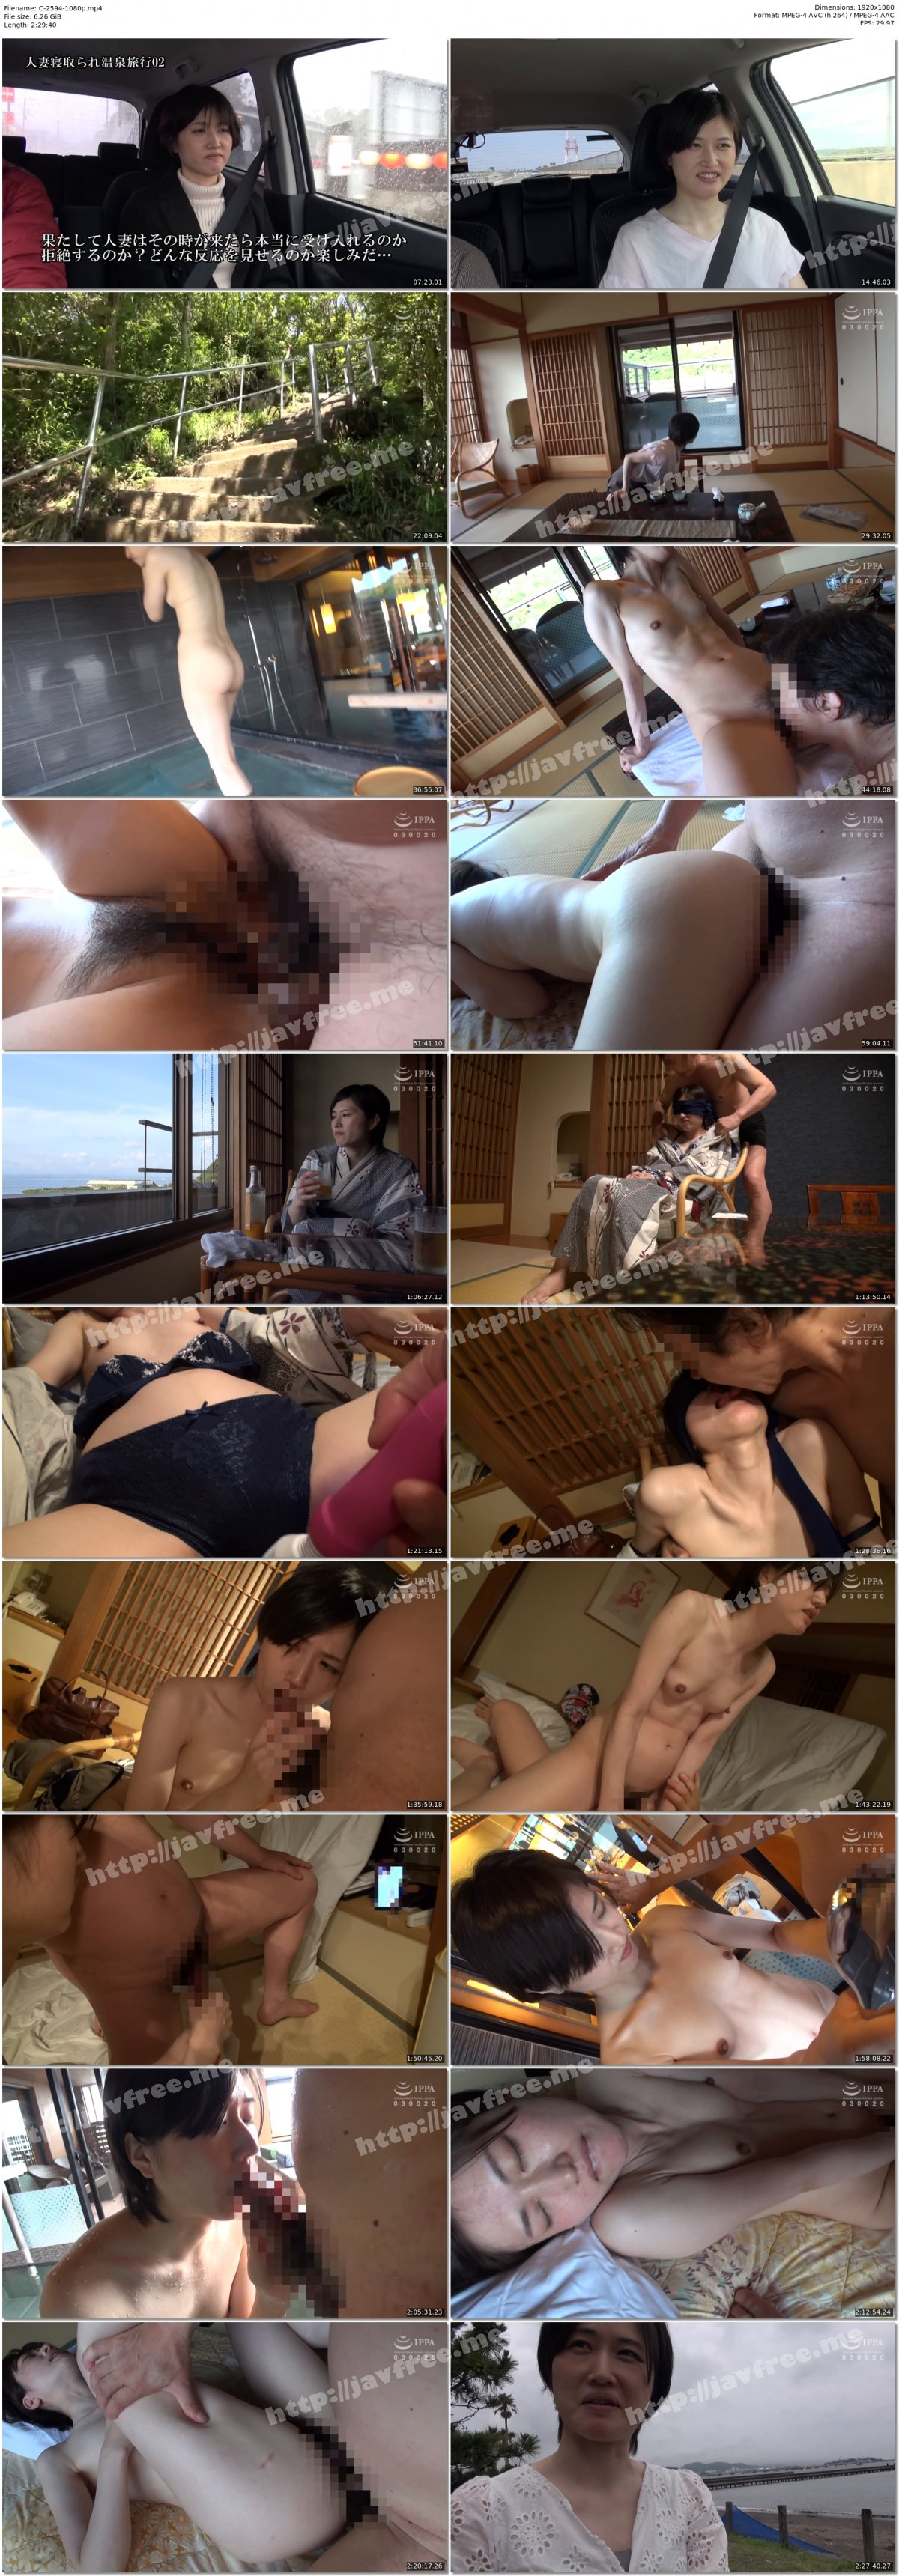 [HD][C-2594] 不倫、それから…008 続人妻寝取られ温泉旅行【二】 - image C-2594-1080p on https://javfree.me